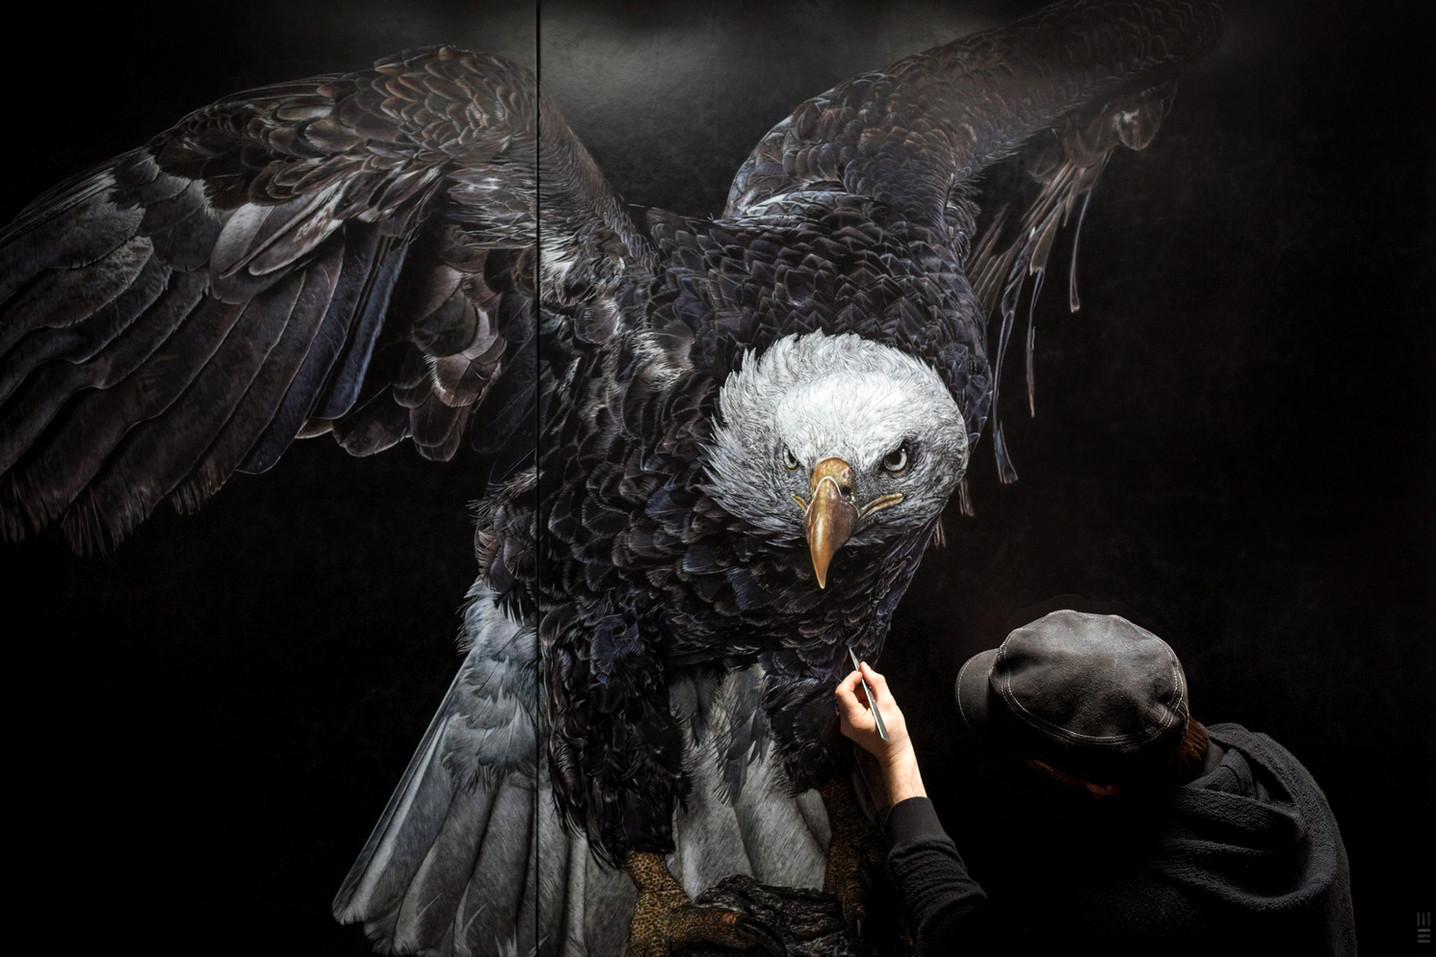 Mark Evans eagle interior mural art